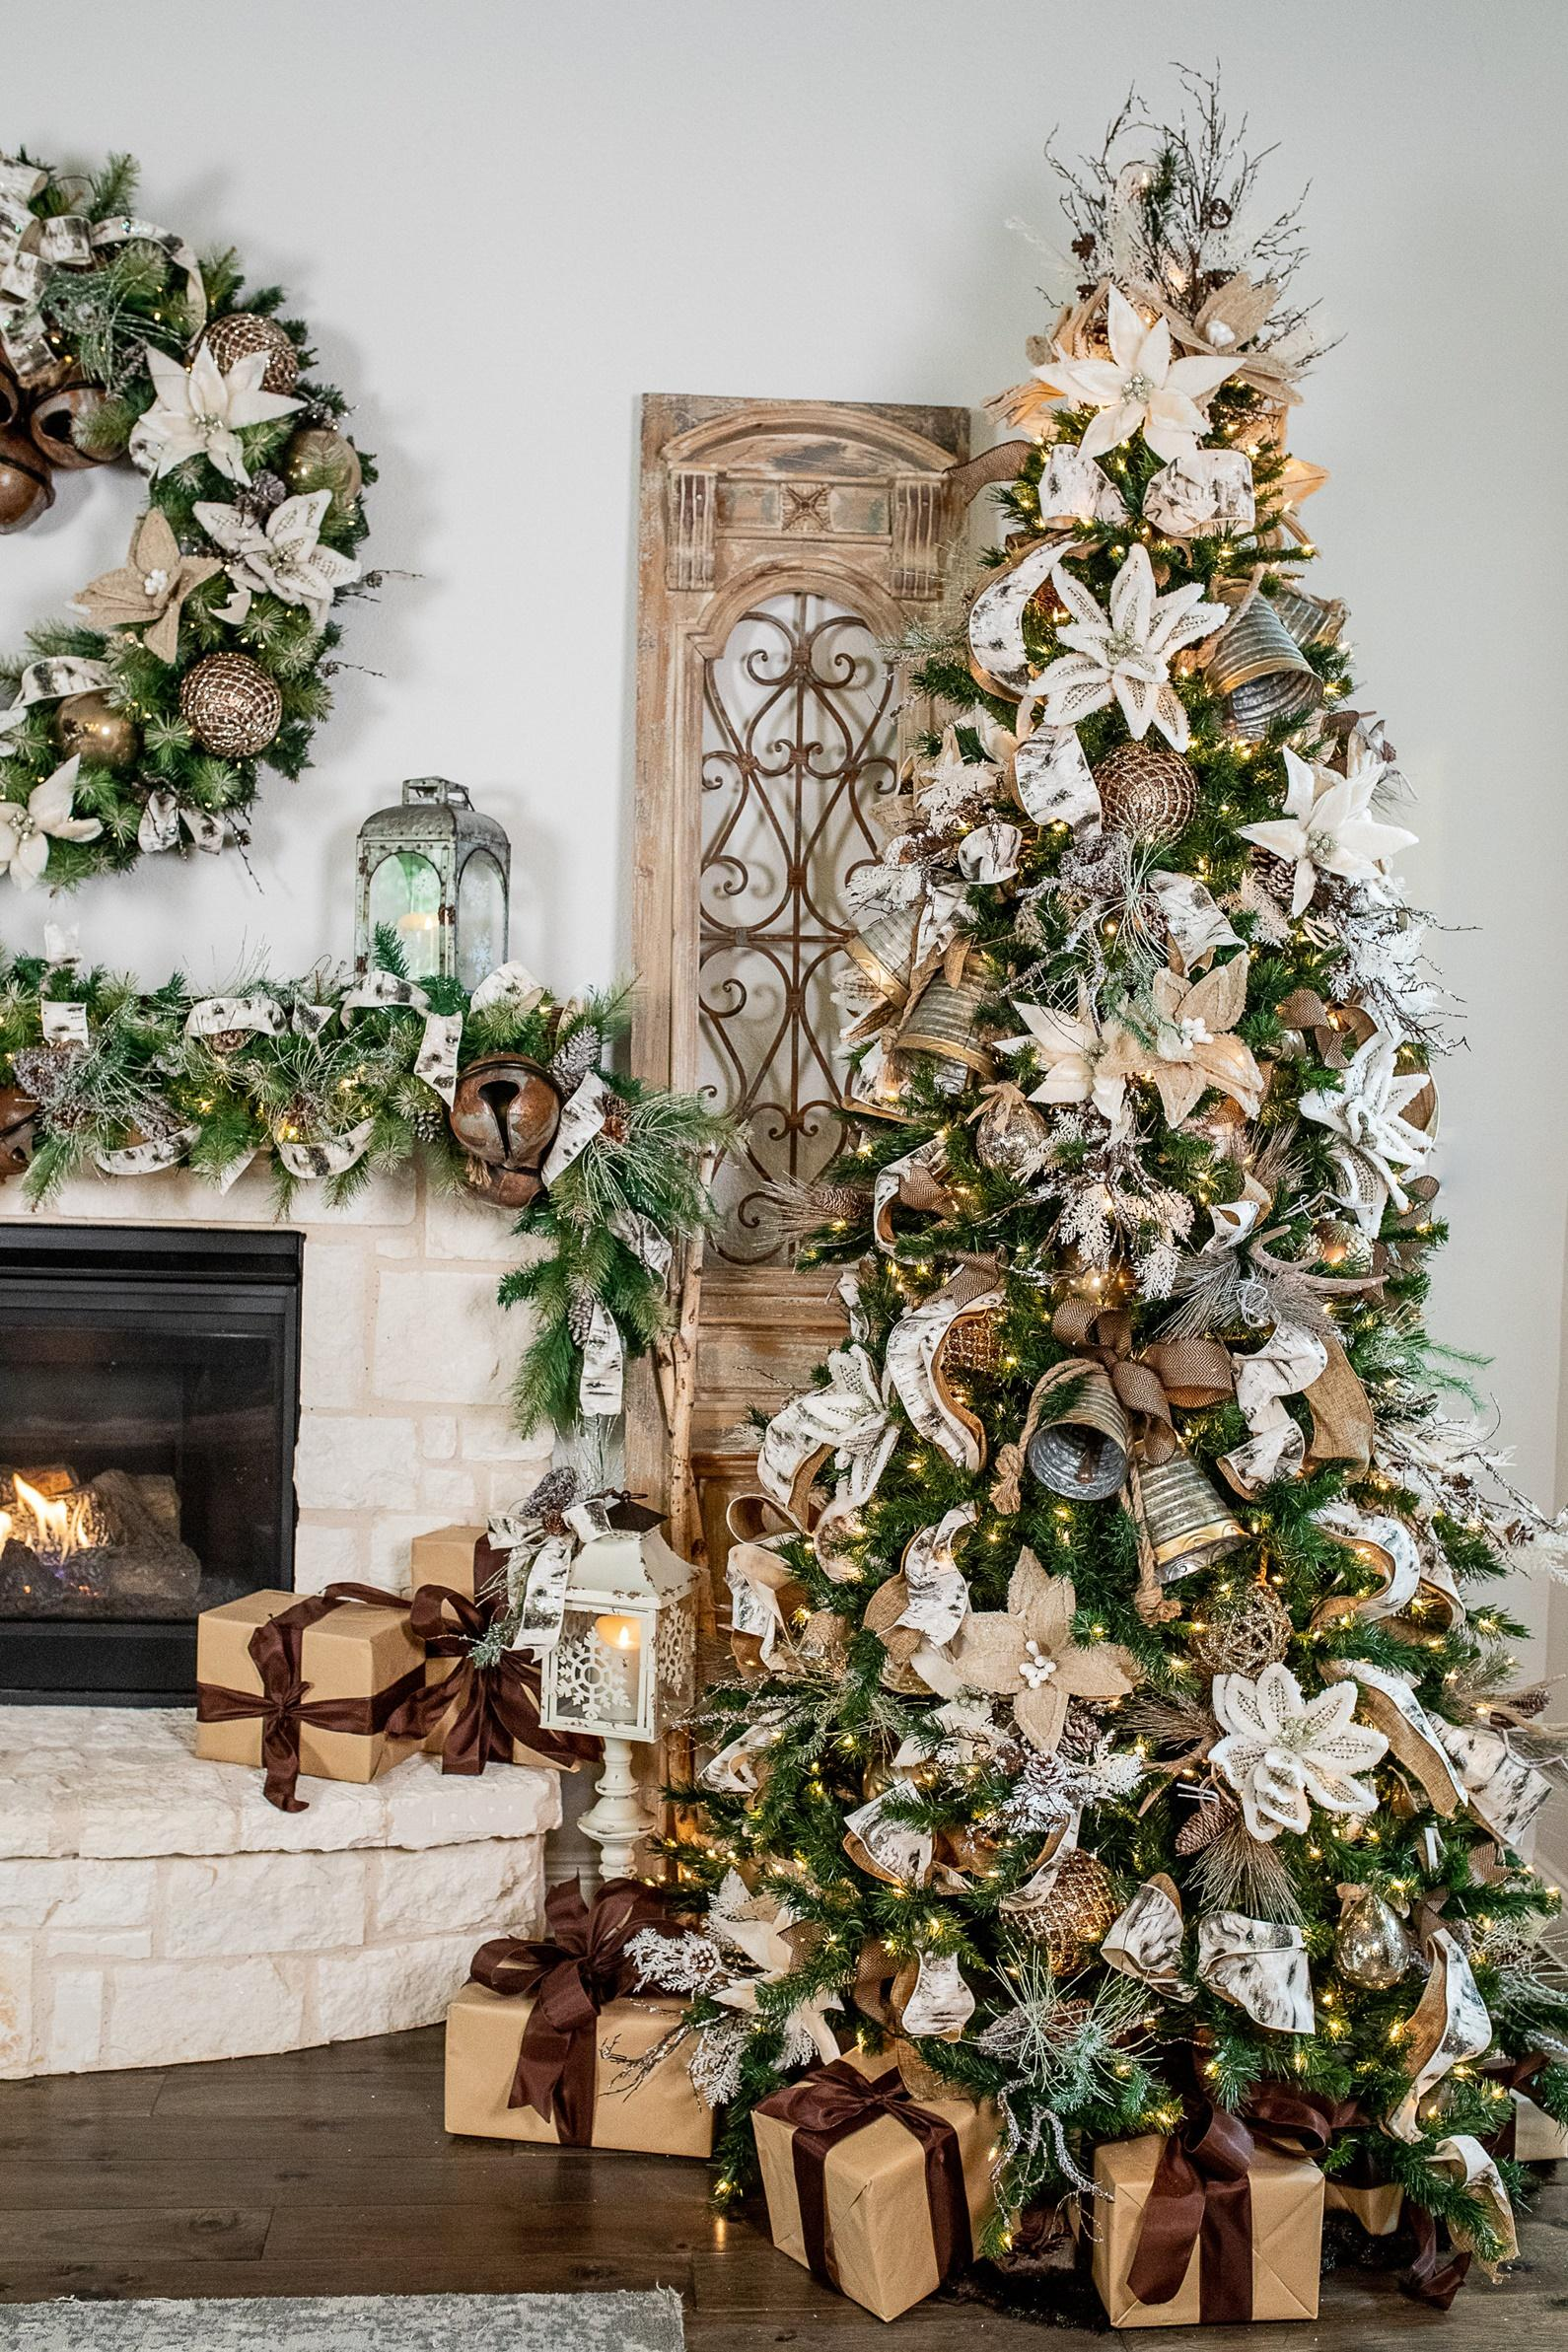 Christmas Decorating Trends 2020: Neutral αποχρώσεις στην χριστουγεννιάτικο δέντρο